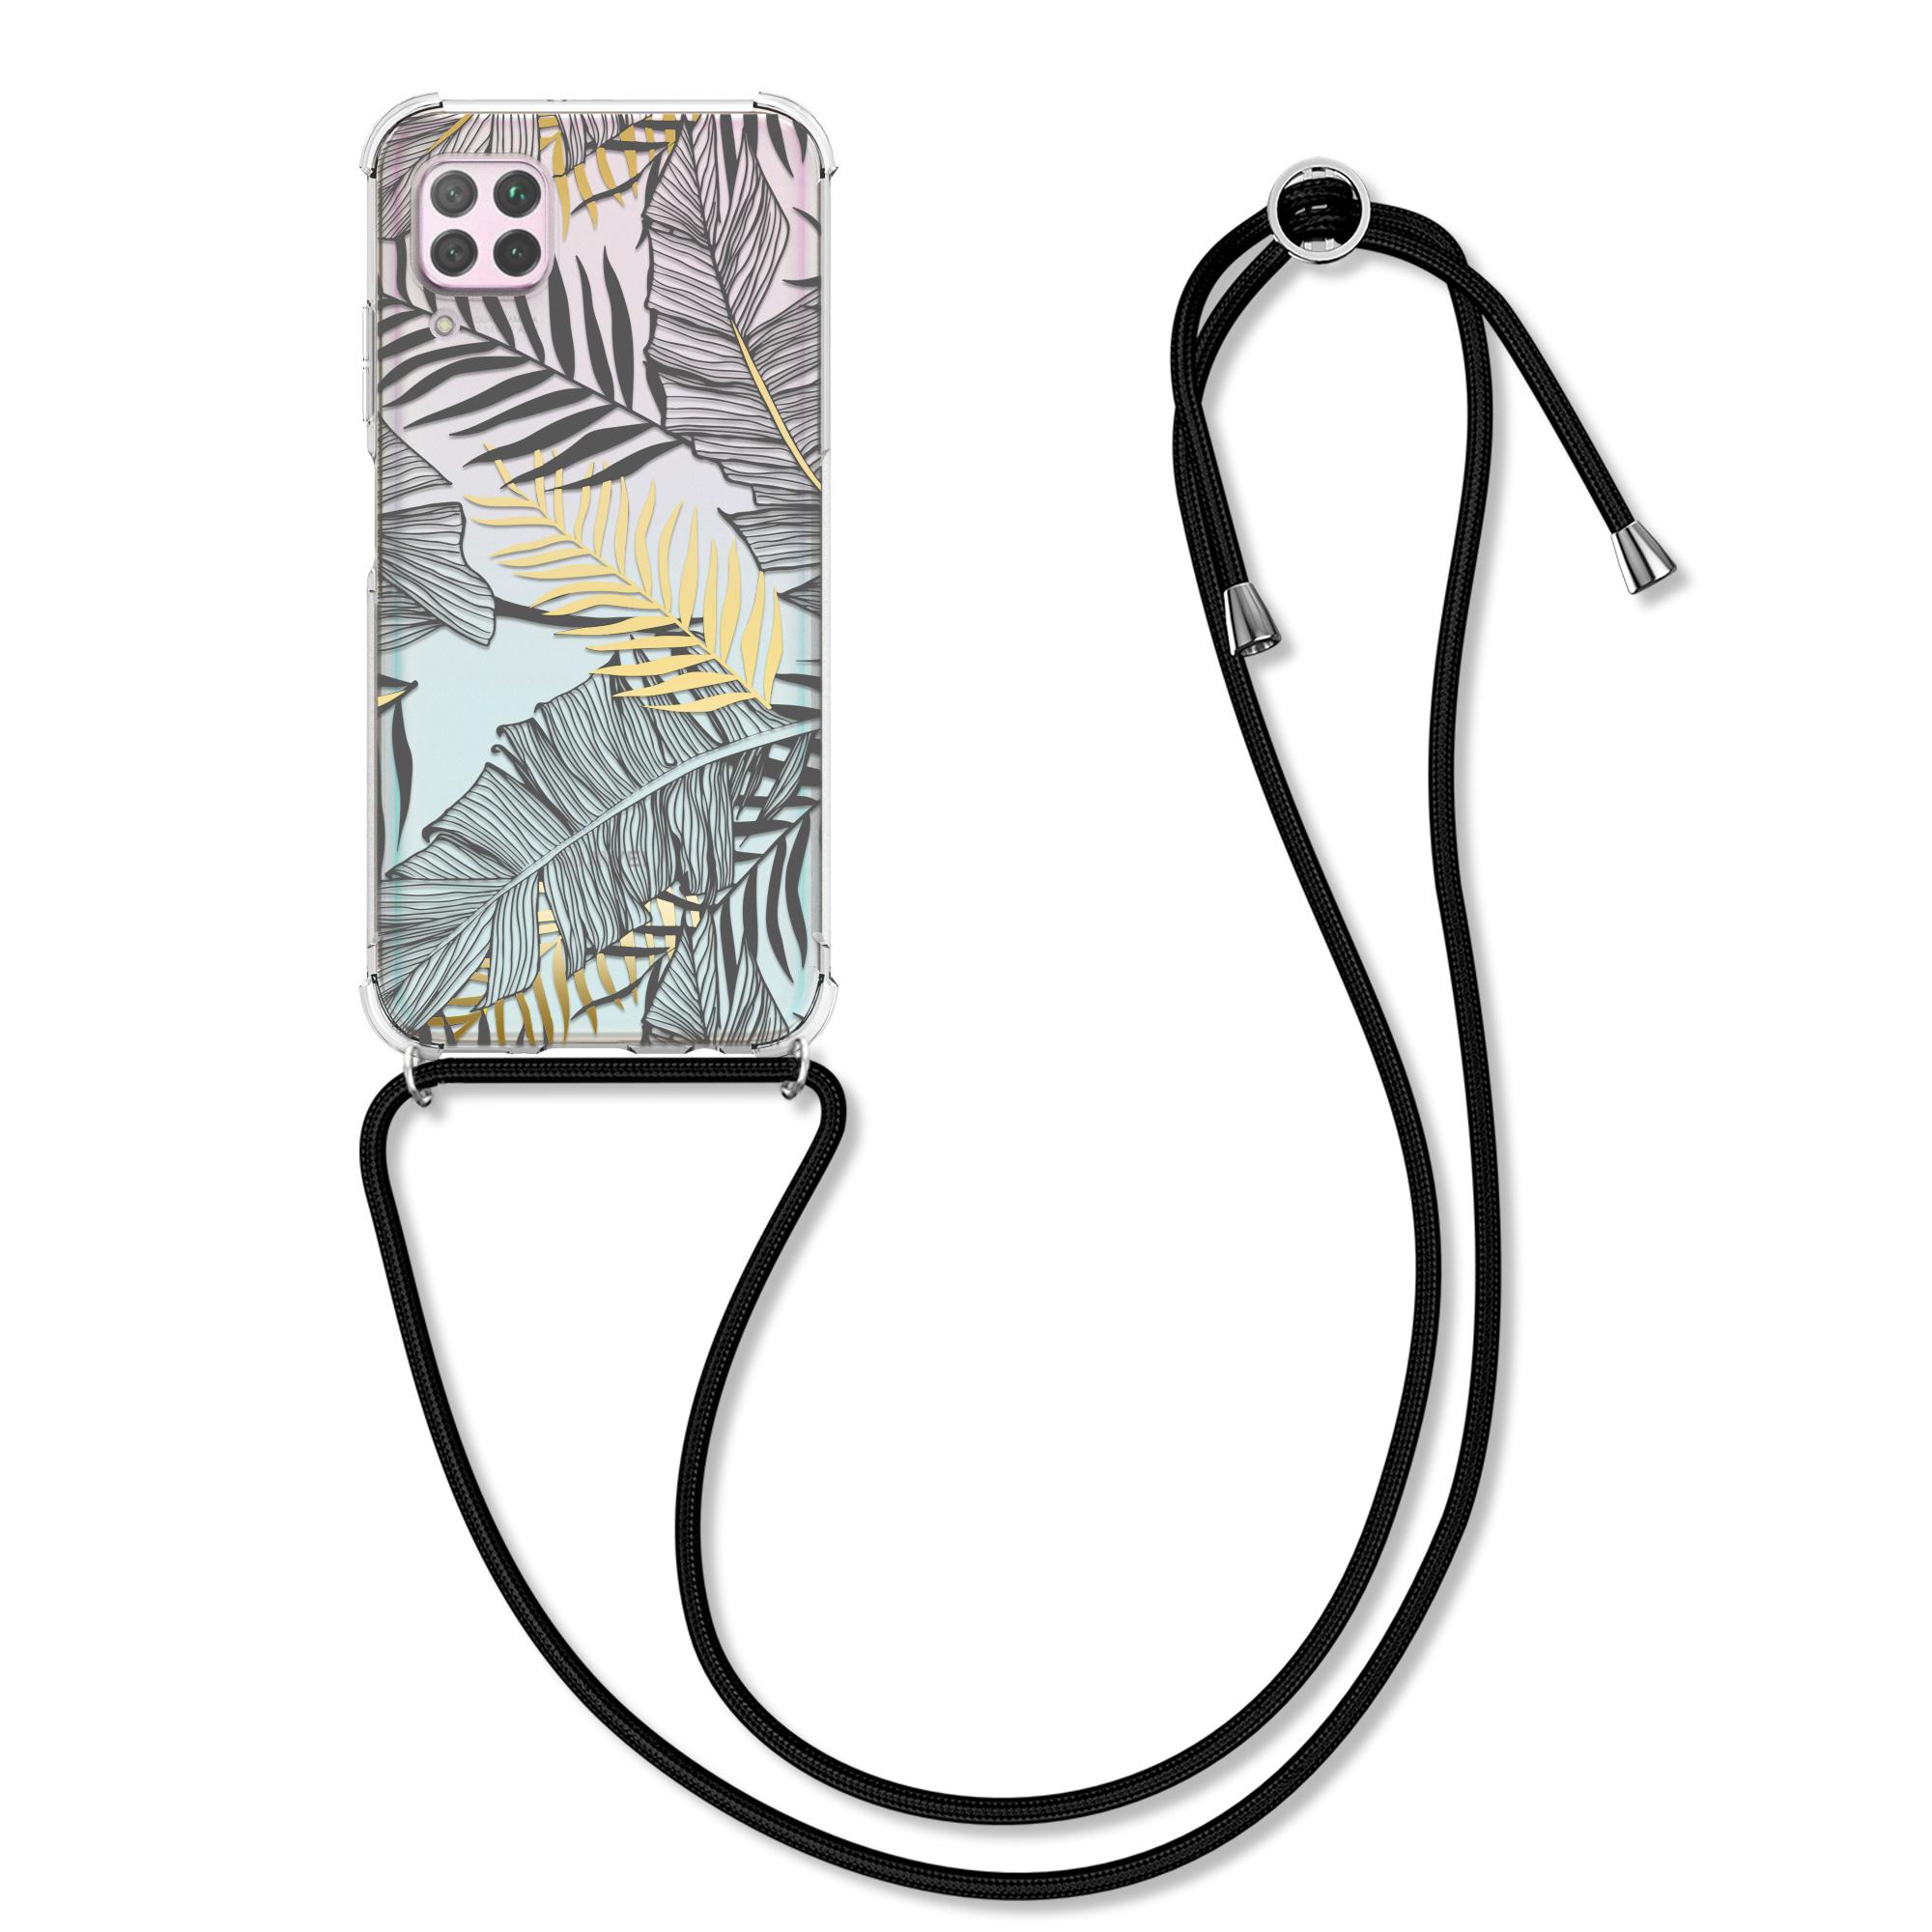 Silikonové pouzdro / obal na krk pro Huawei P40 Lite s motivem listů palmy